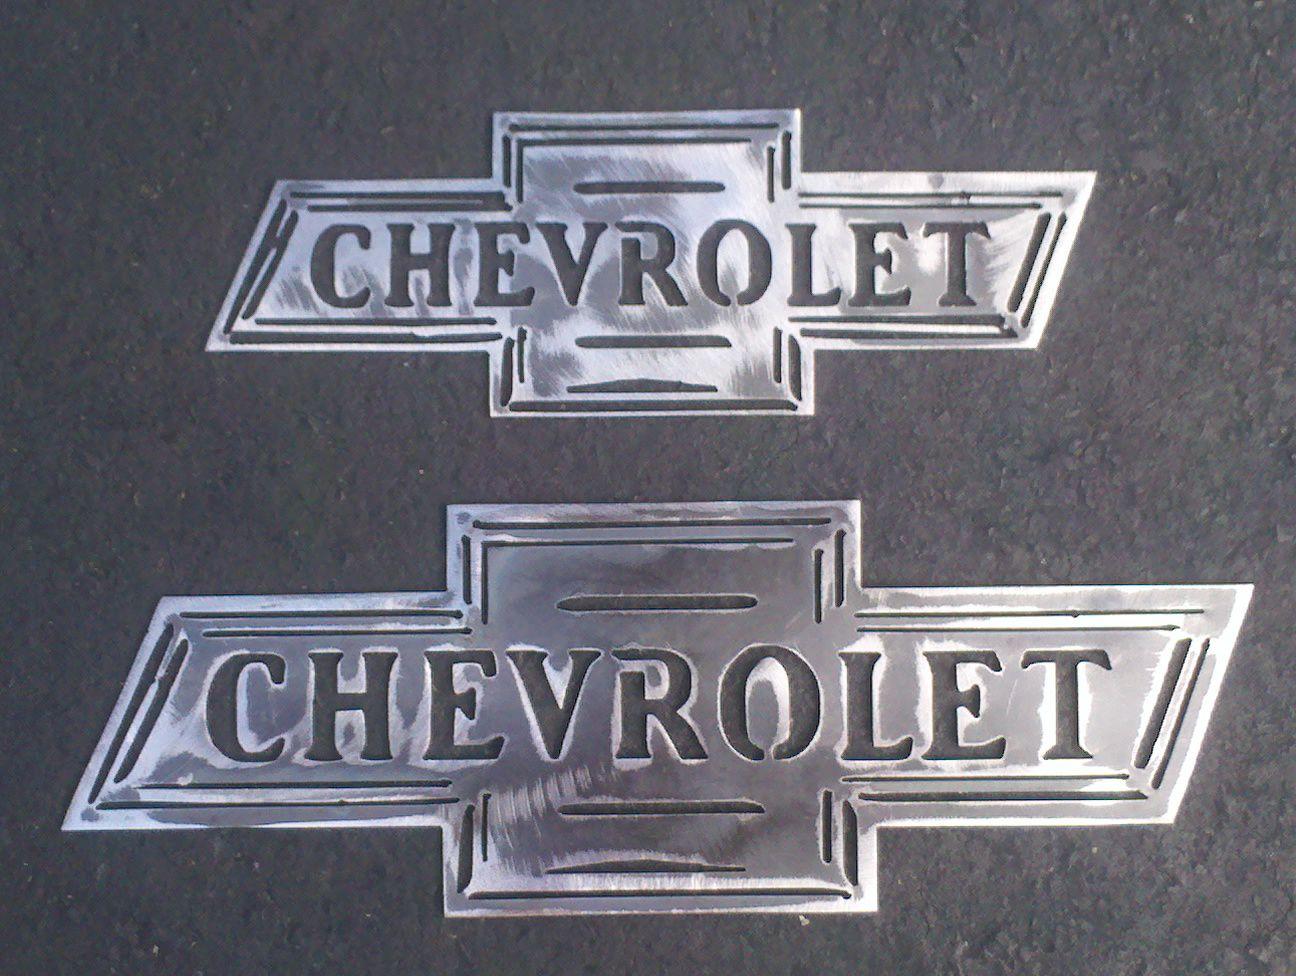 Old skool chevy logo with grunge detail metal art metal art old skool chevy logo with grunge detail metal art biocorpaavc Images